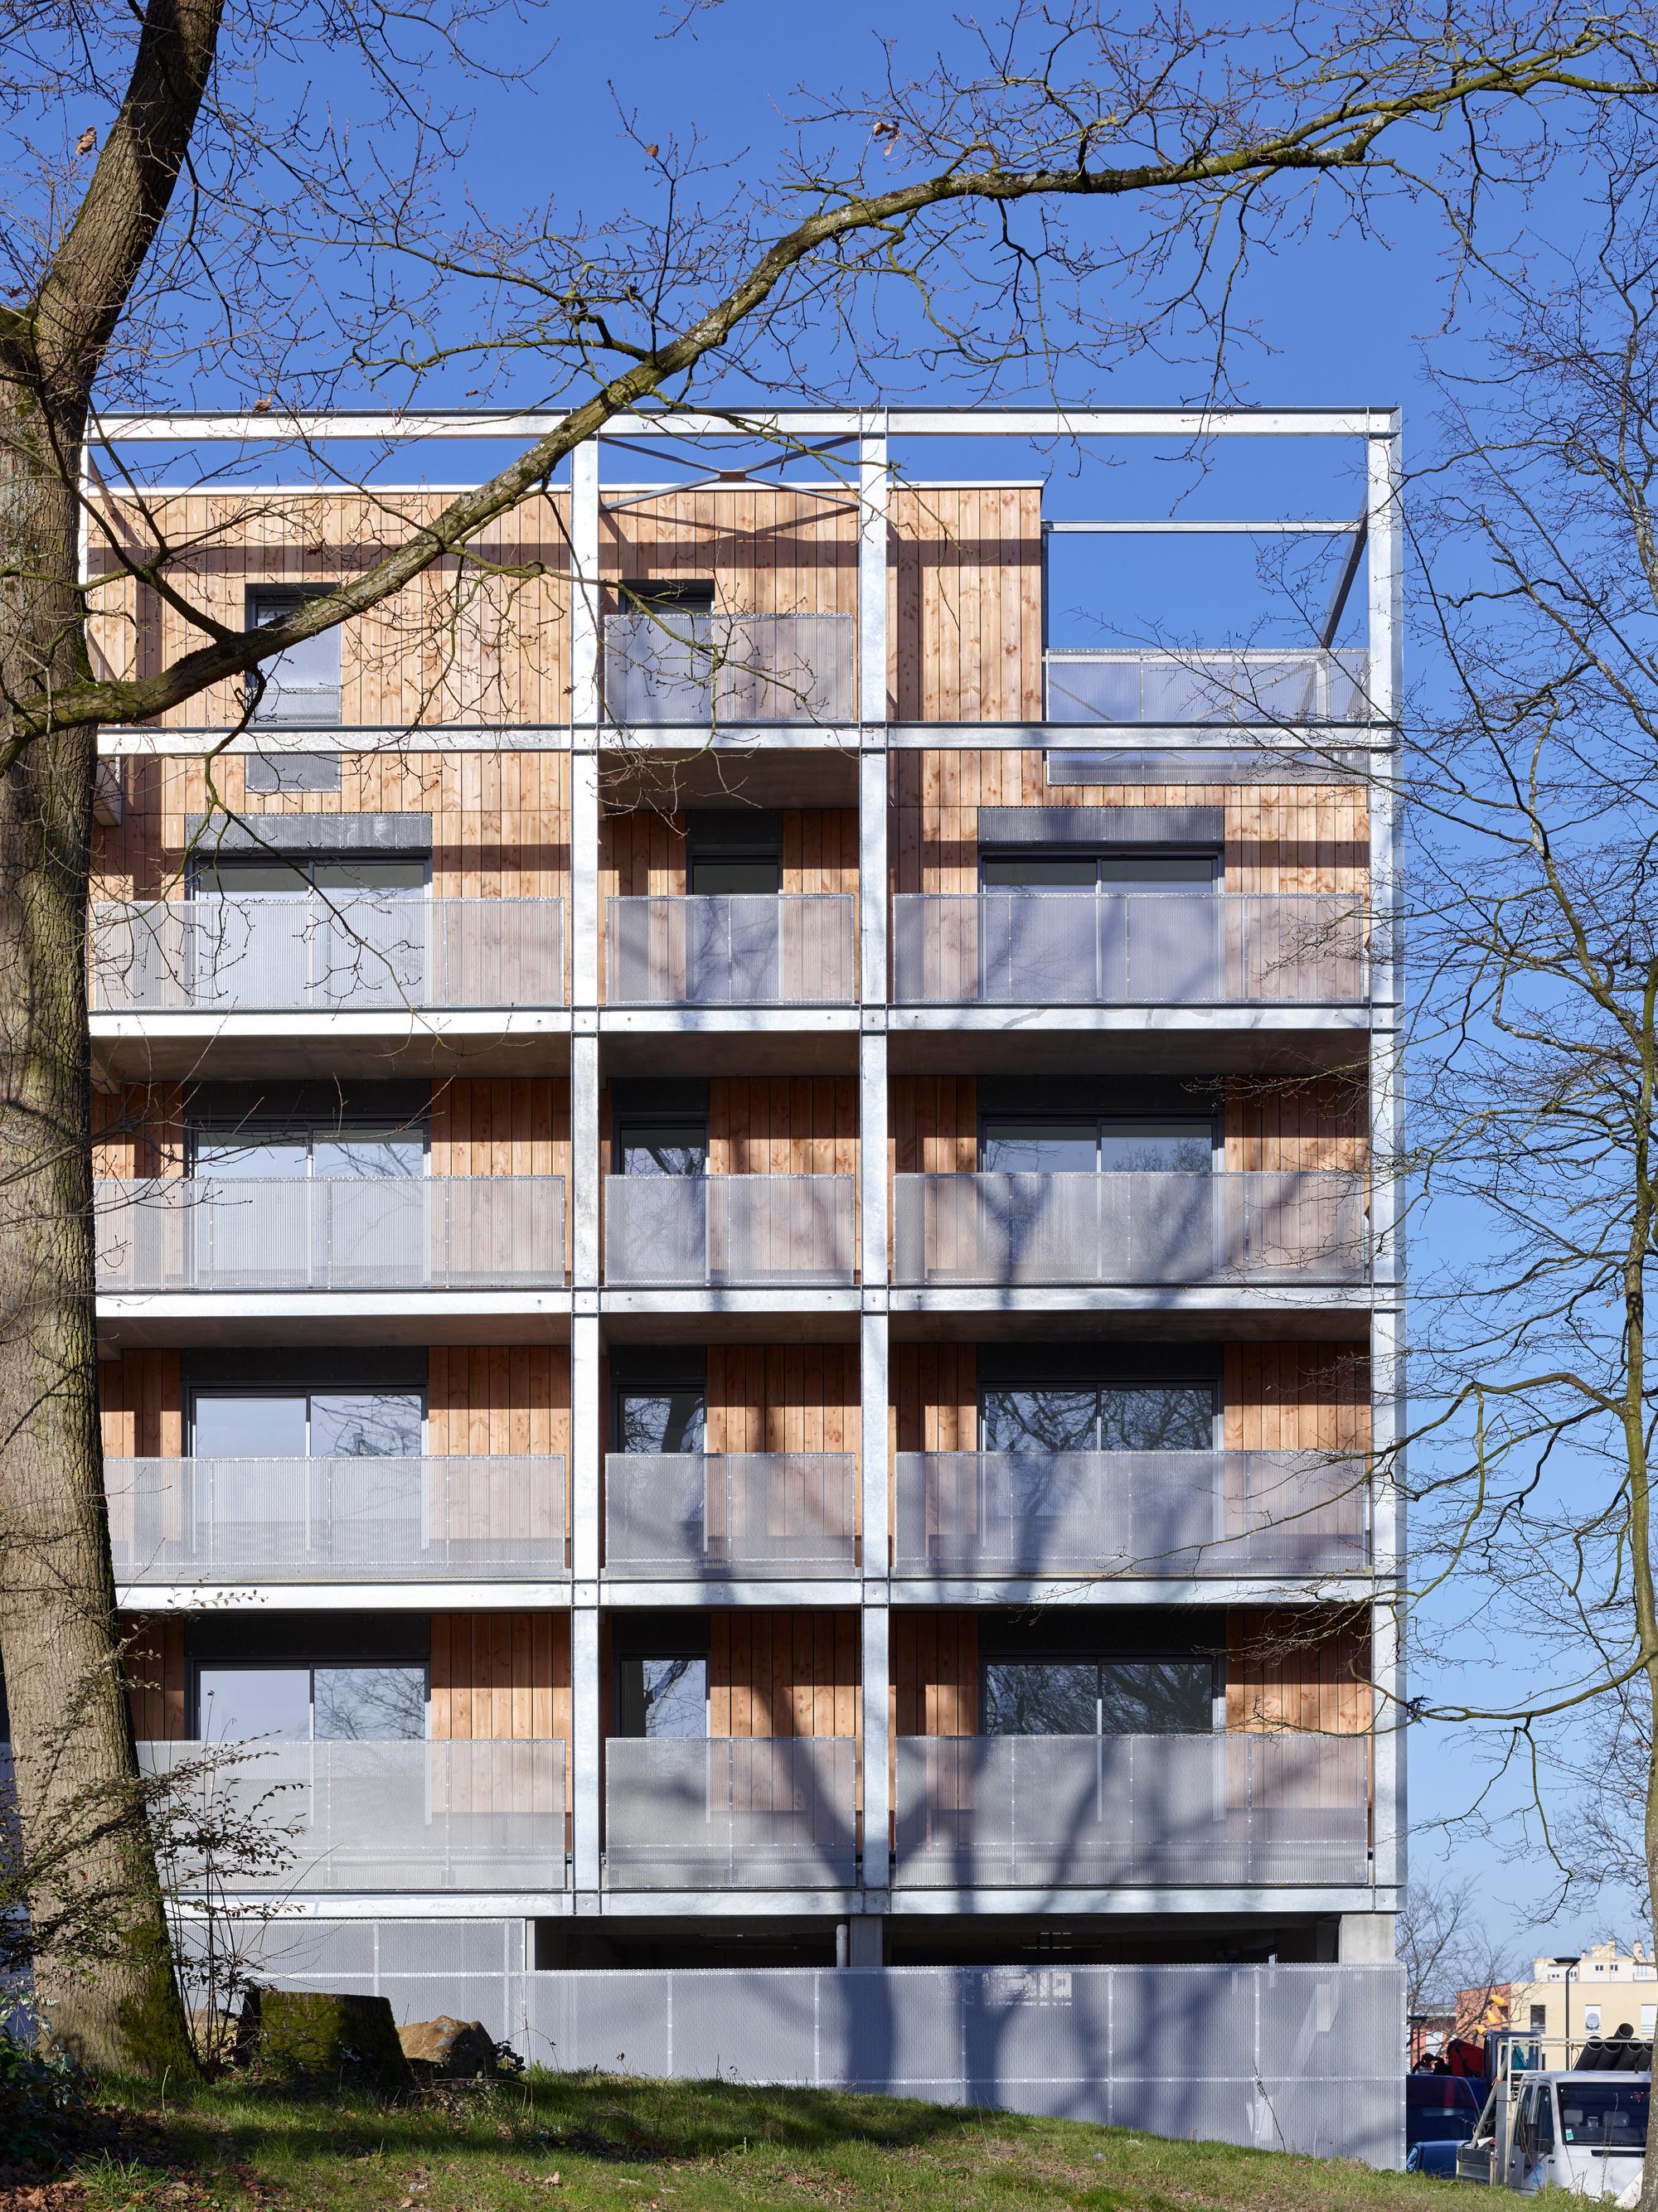 gallery of callot b1 housing jacques boucheton architectes 4. Black Bedroom Furniture Sets. Home Design Ideas